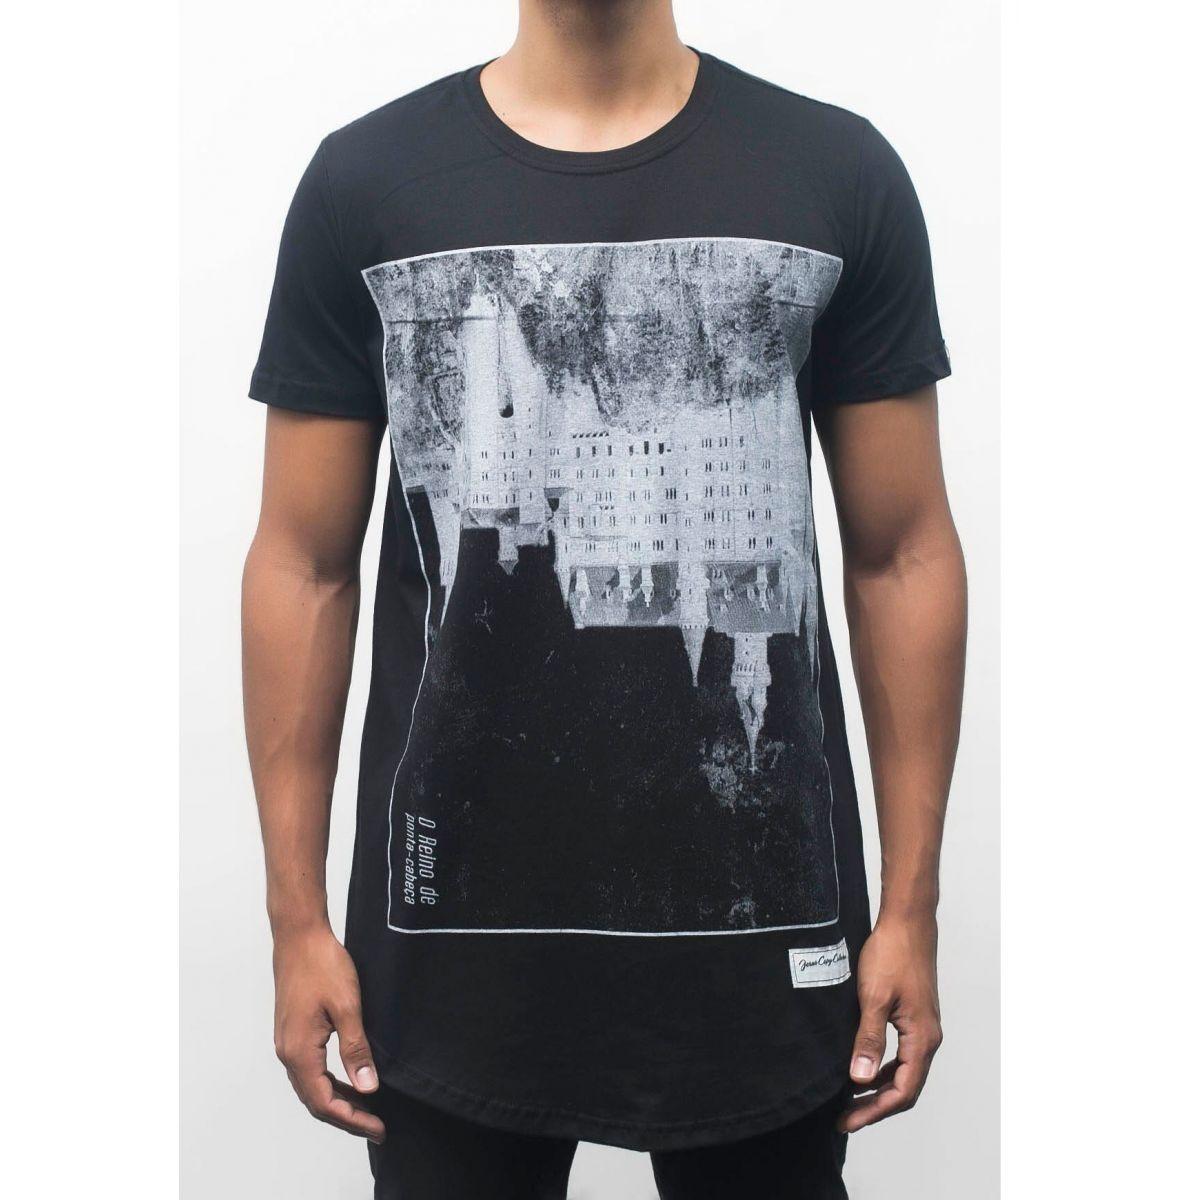 Camiseta  Upside Down Castle Masculina - #REINODEPONTACABEÇA  - Jesuscopy